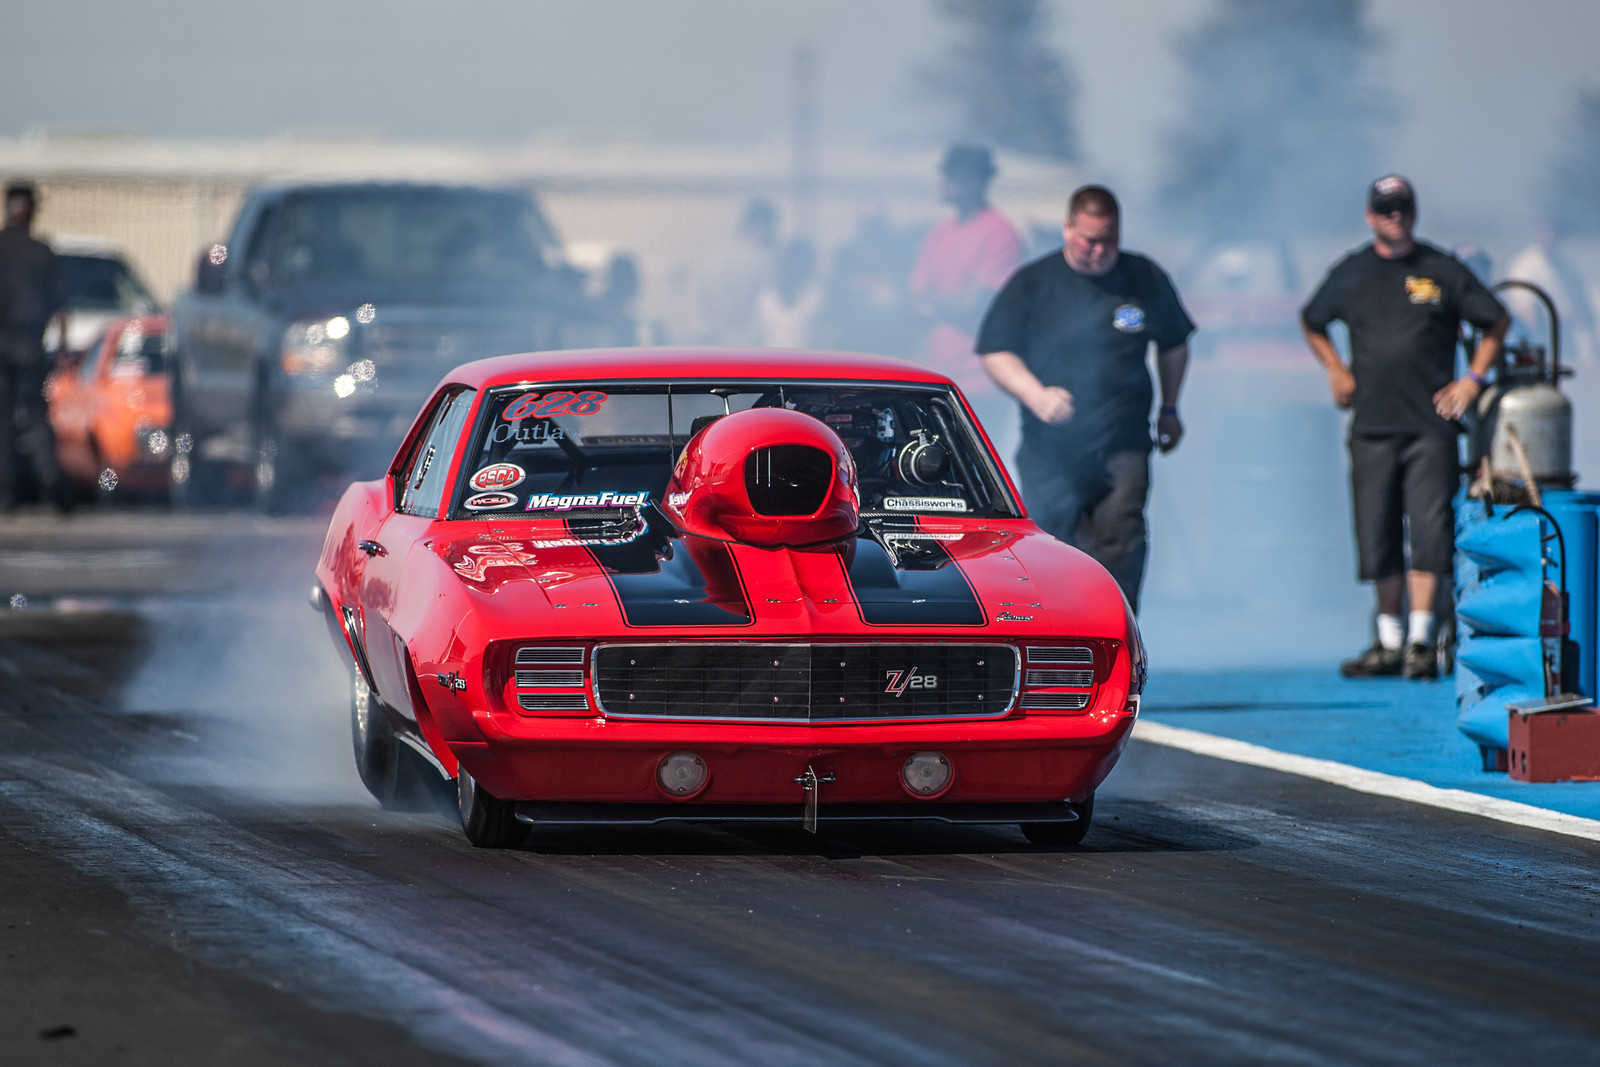 NHRA drag racing race hot rod rods chevrolet camaro wallpaper 1600x1067